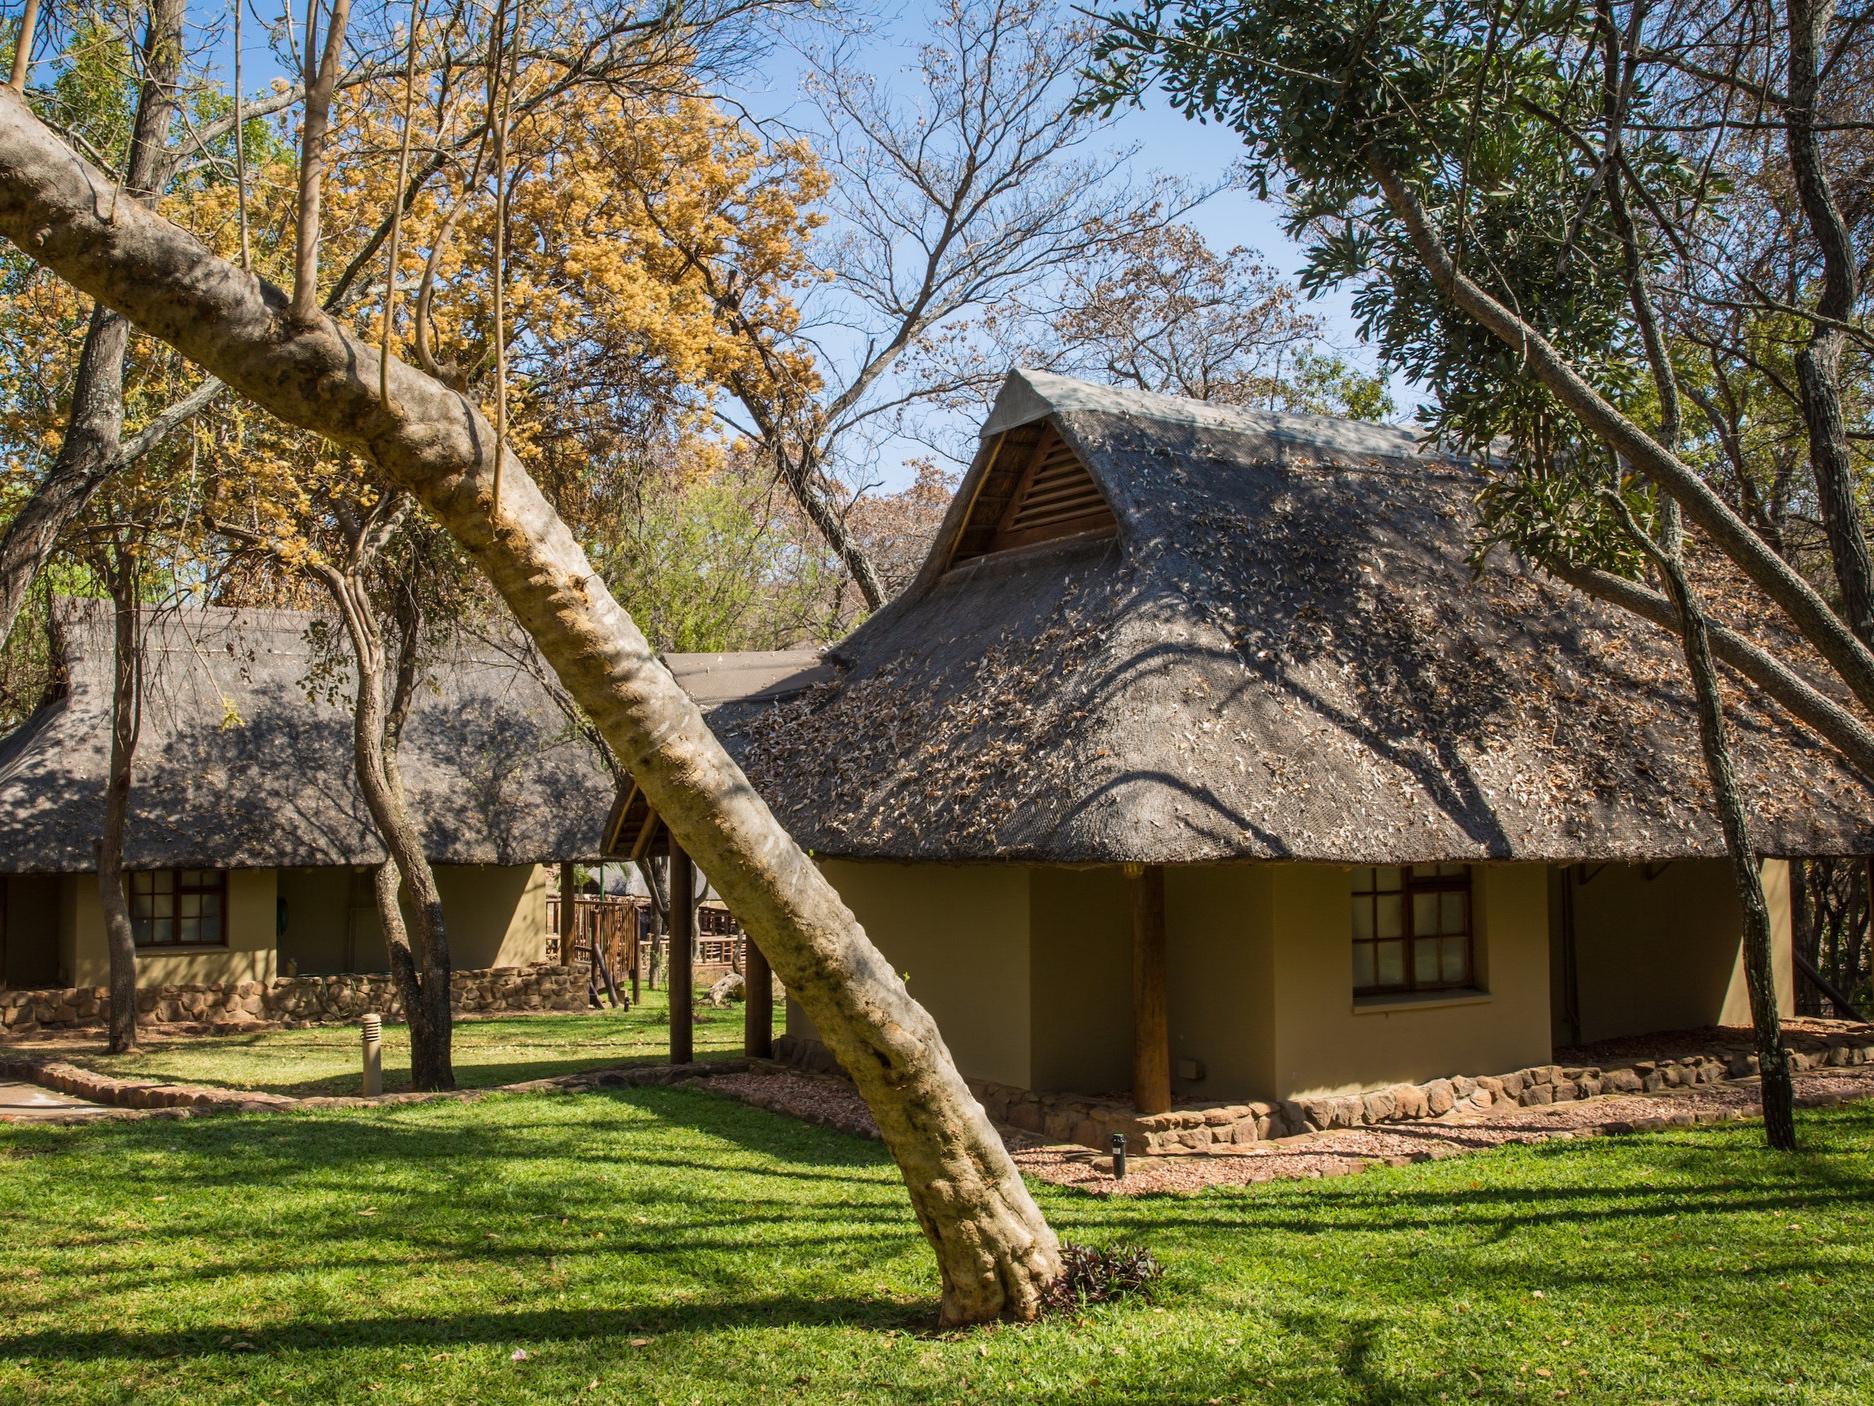 Lion+lodge+bungalows+Kopie.jpg